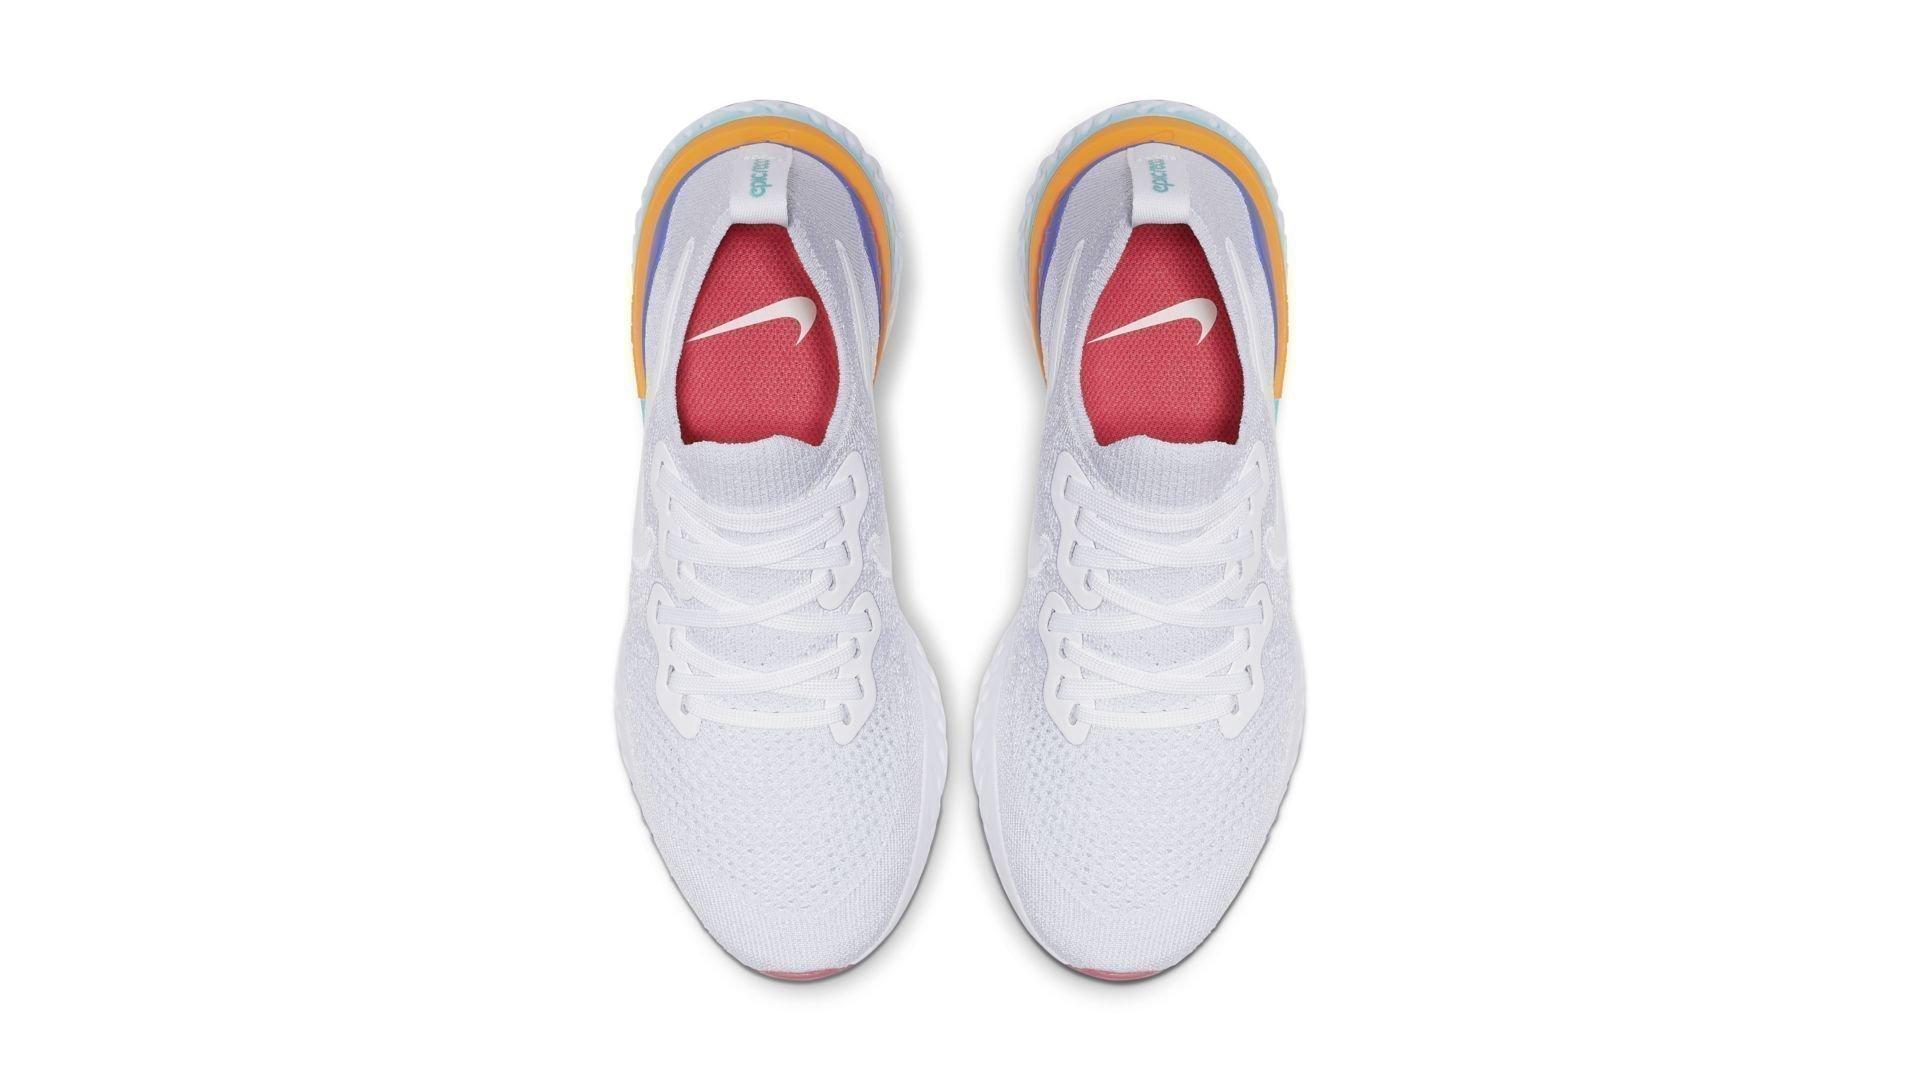 Nike Epic React Flyknit 2 White Hyper Jade Ember Glow (W) (BQ8927-104)